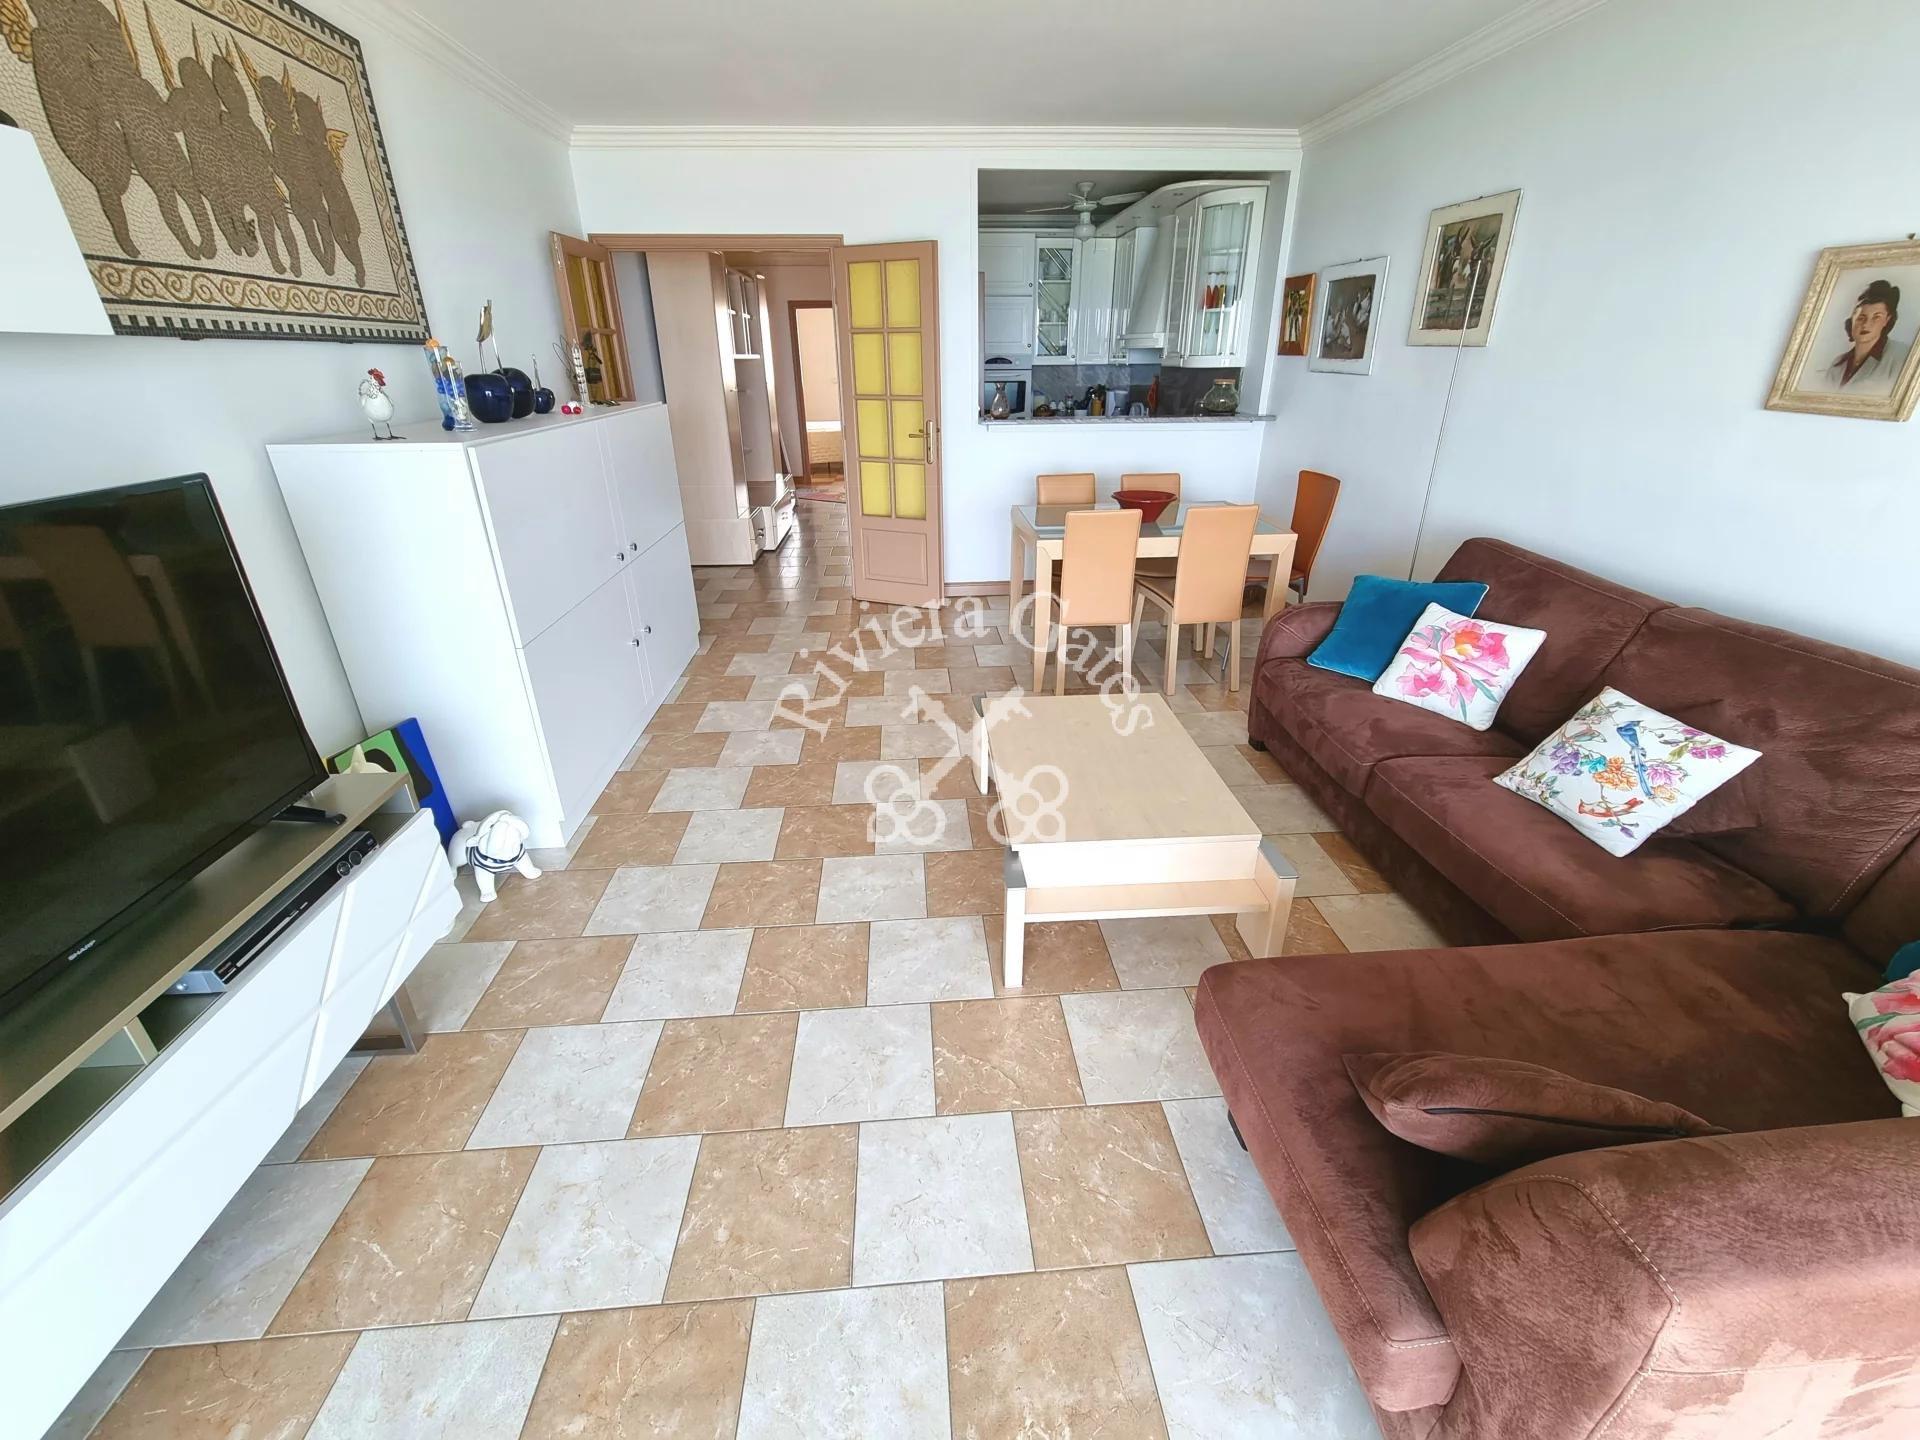 Seasonal rental Apartment - Cagnes-sur-Mer Cros de Cagnes